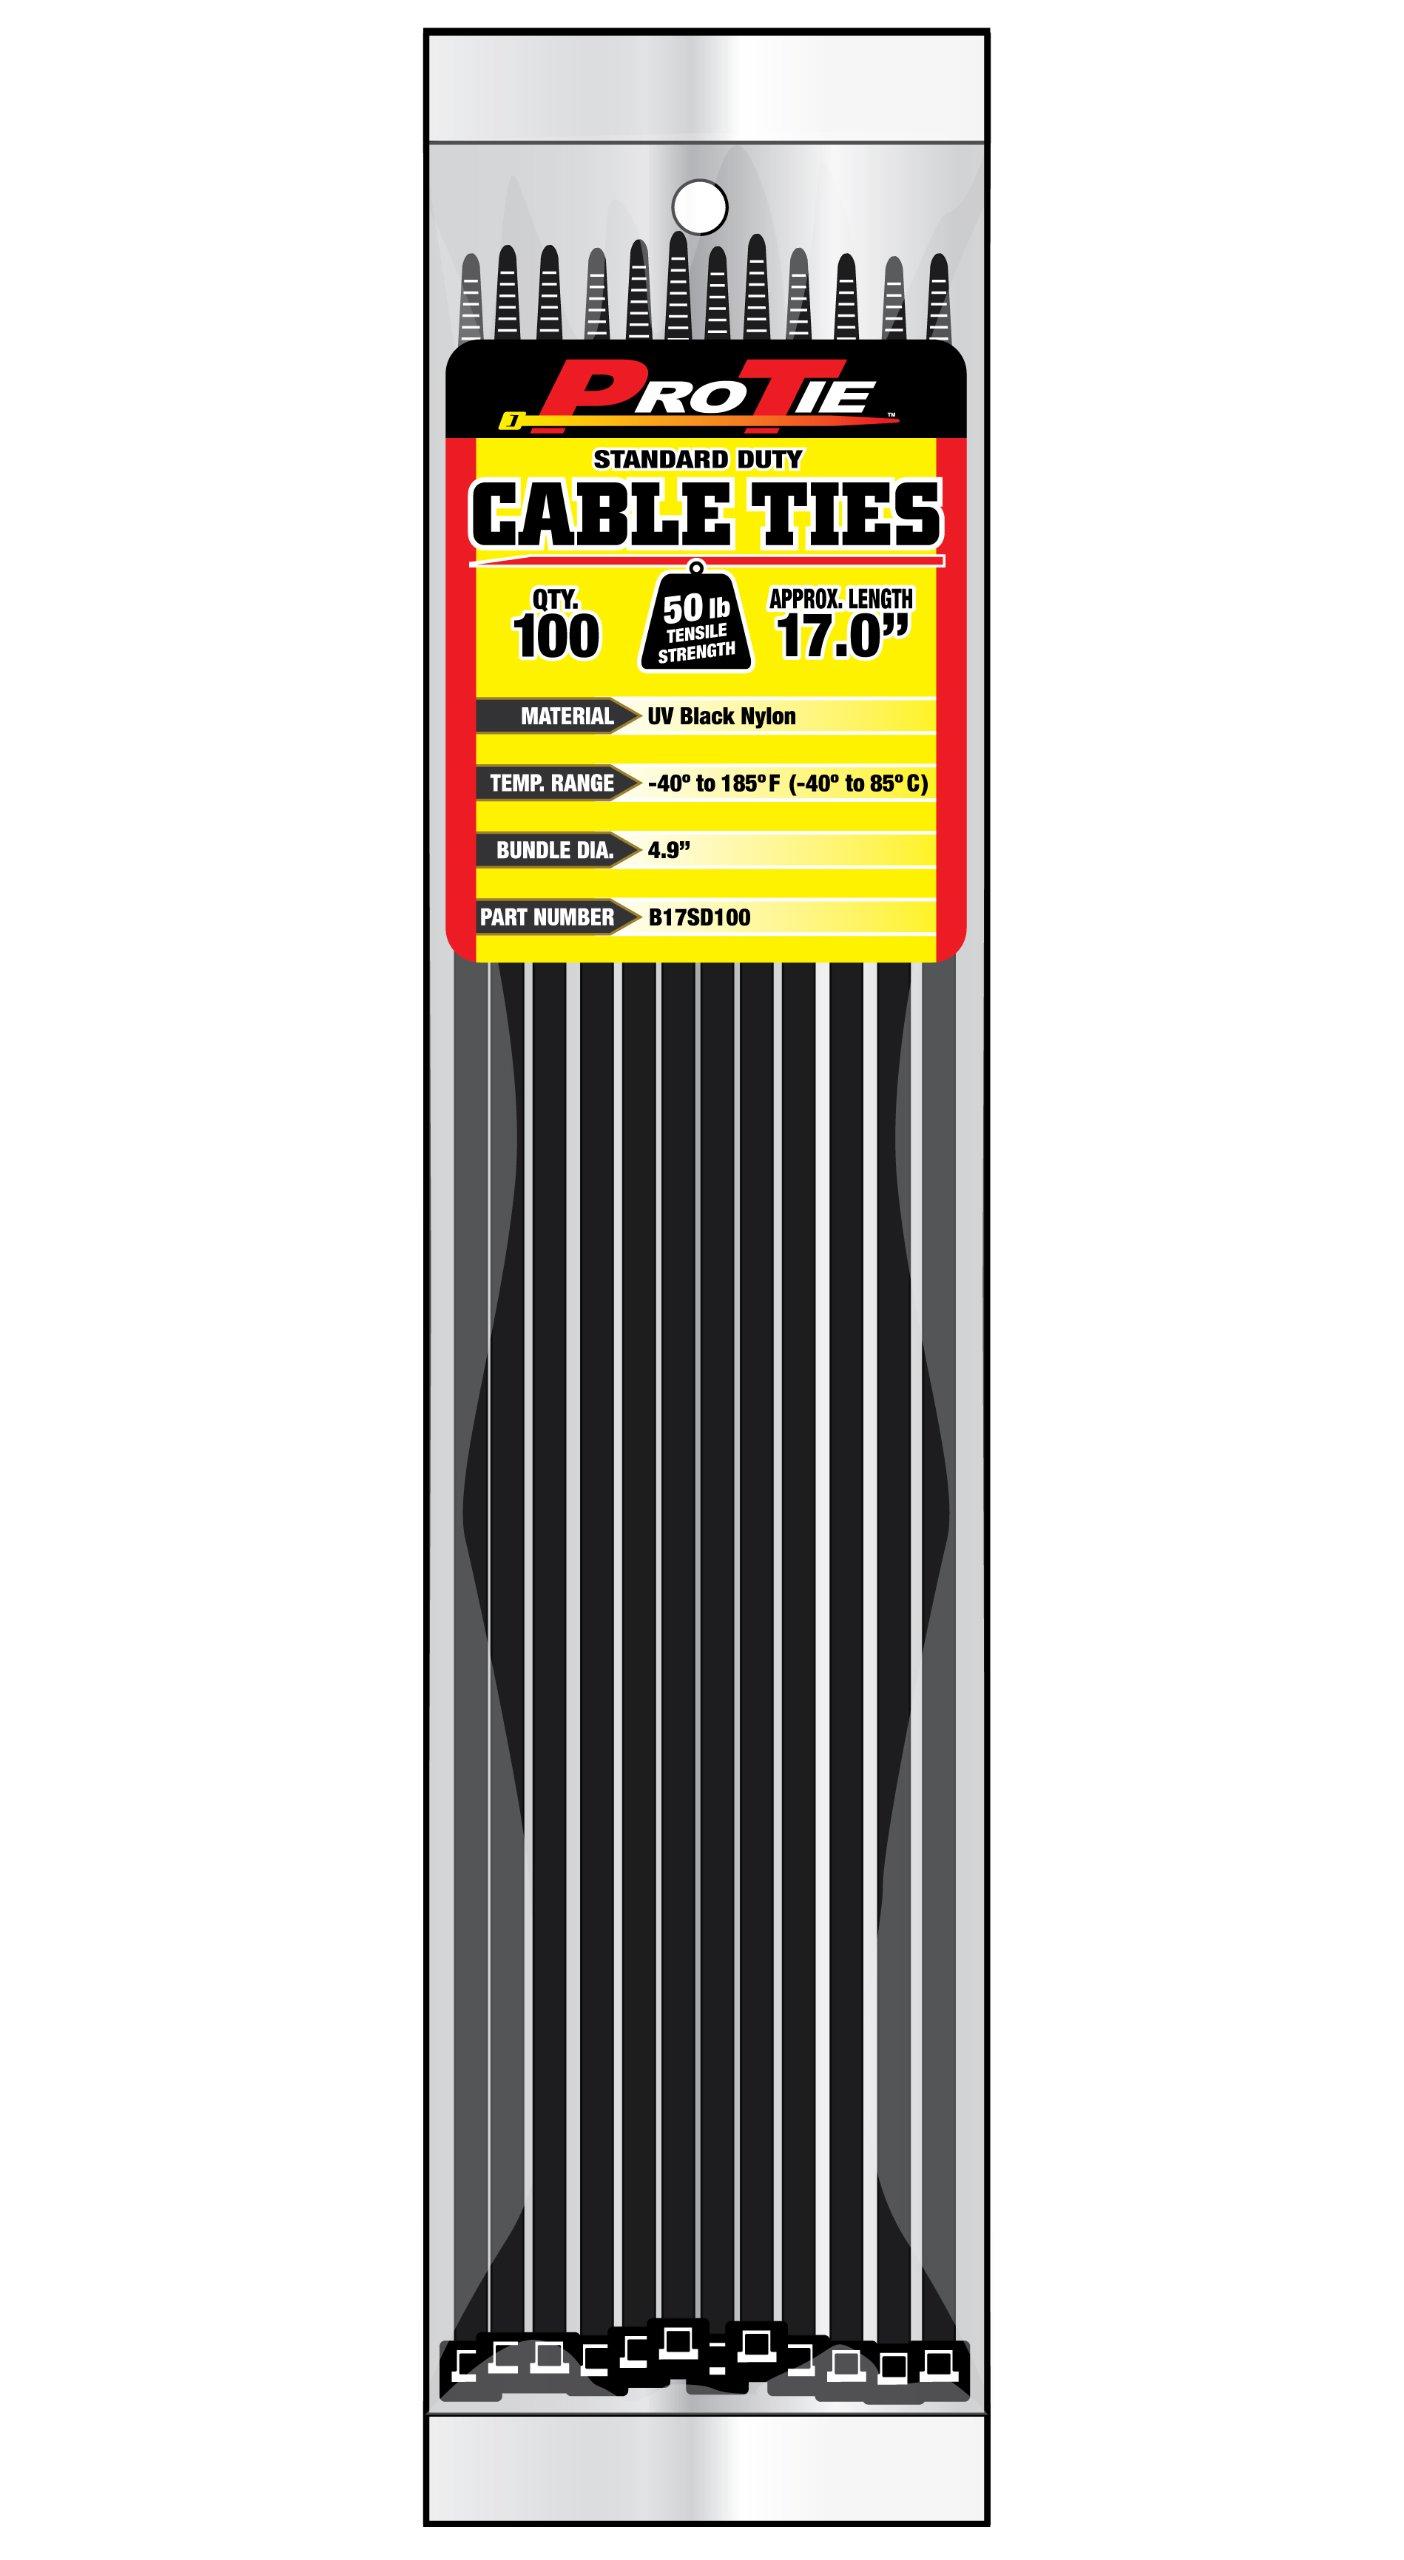 Pro Tie B17SD100 17-Inch Standard Duty Cable Tie, UV Black Nylon, 100-Pack